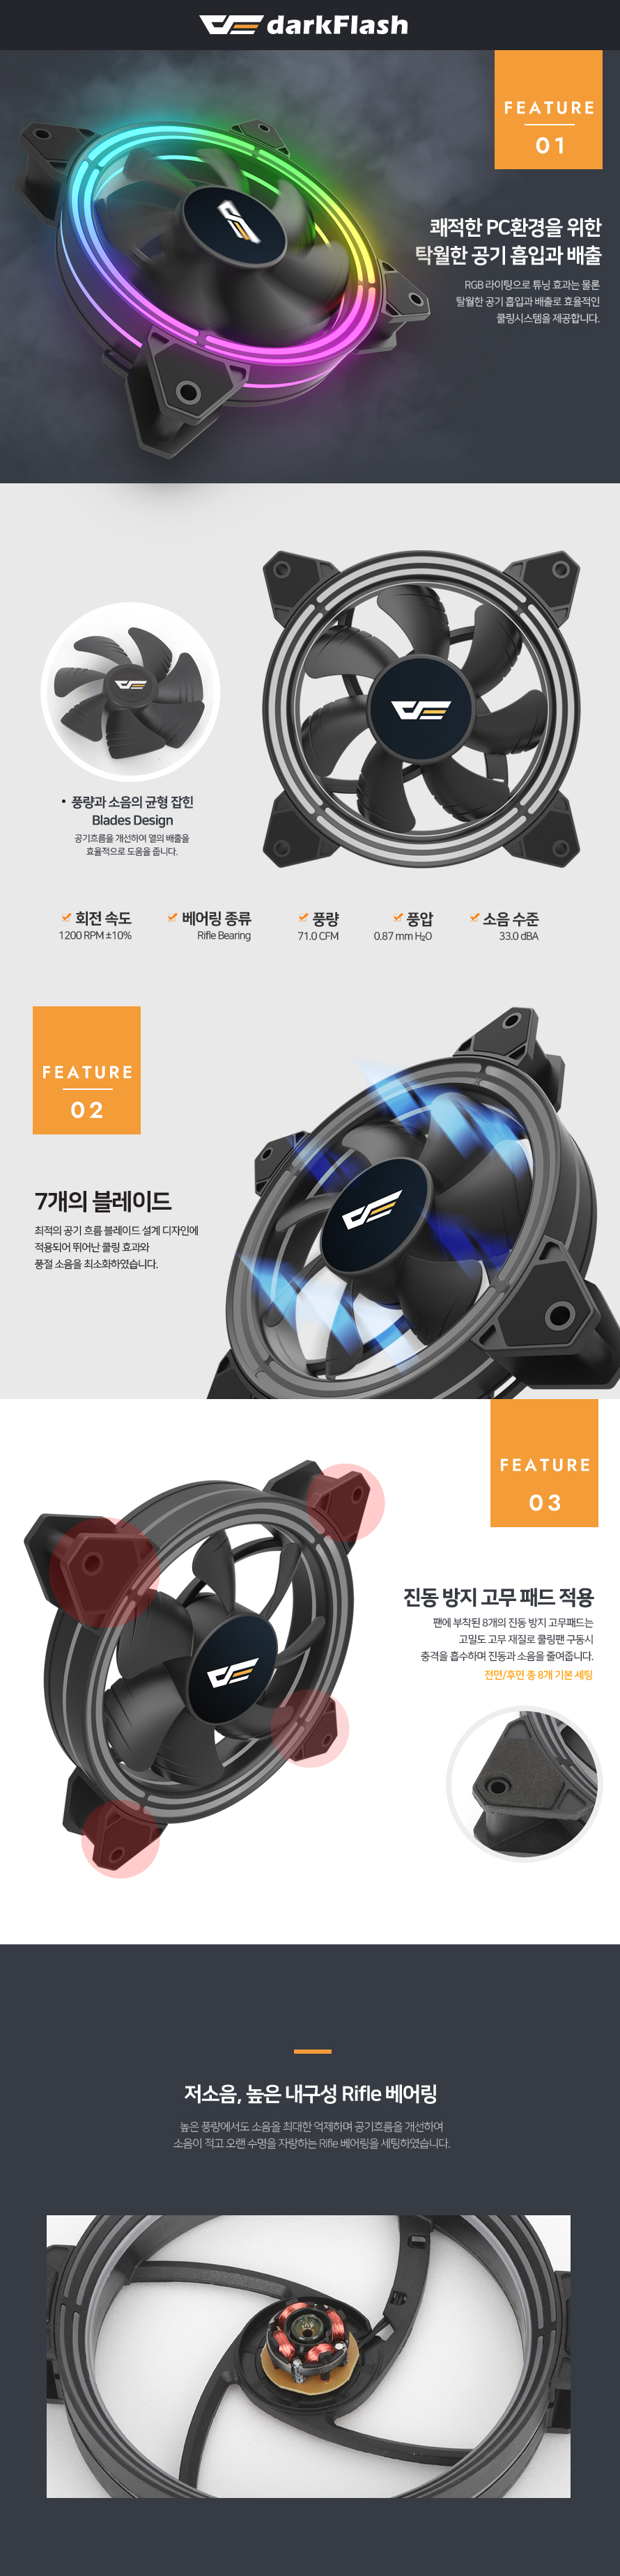 darkFlash CF140 PRO ARGB (1PACK)